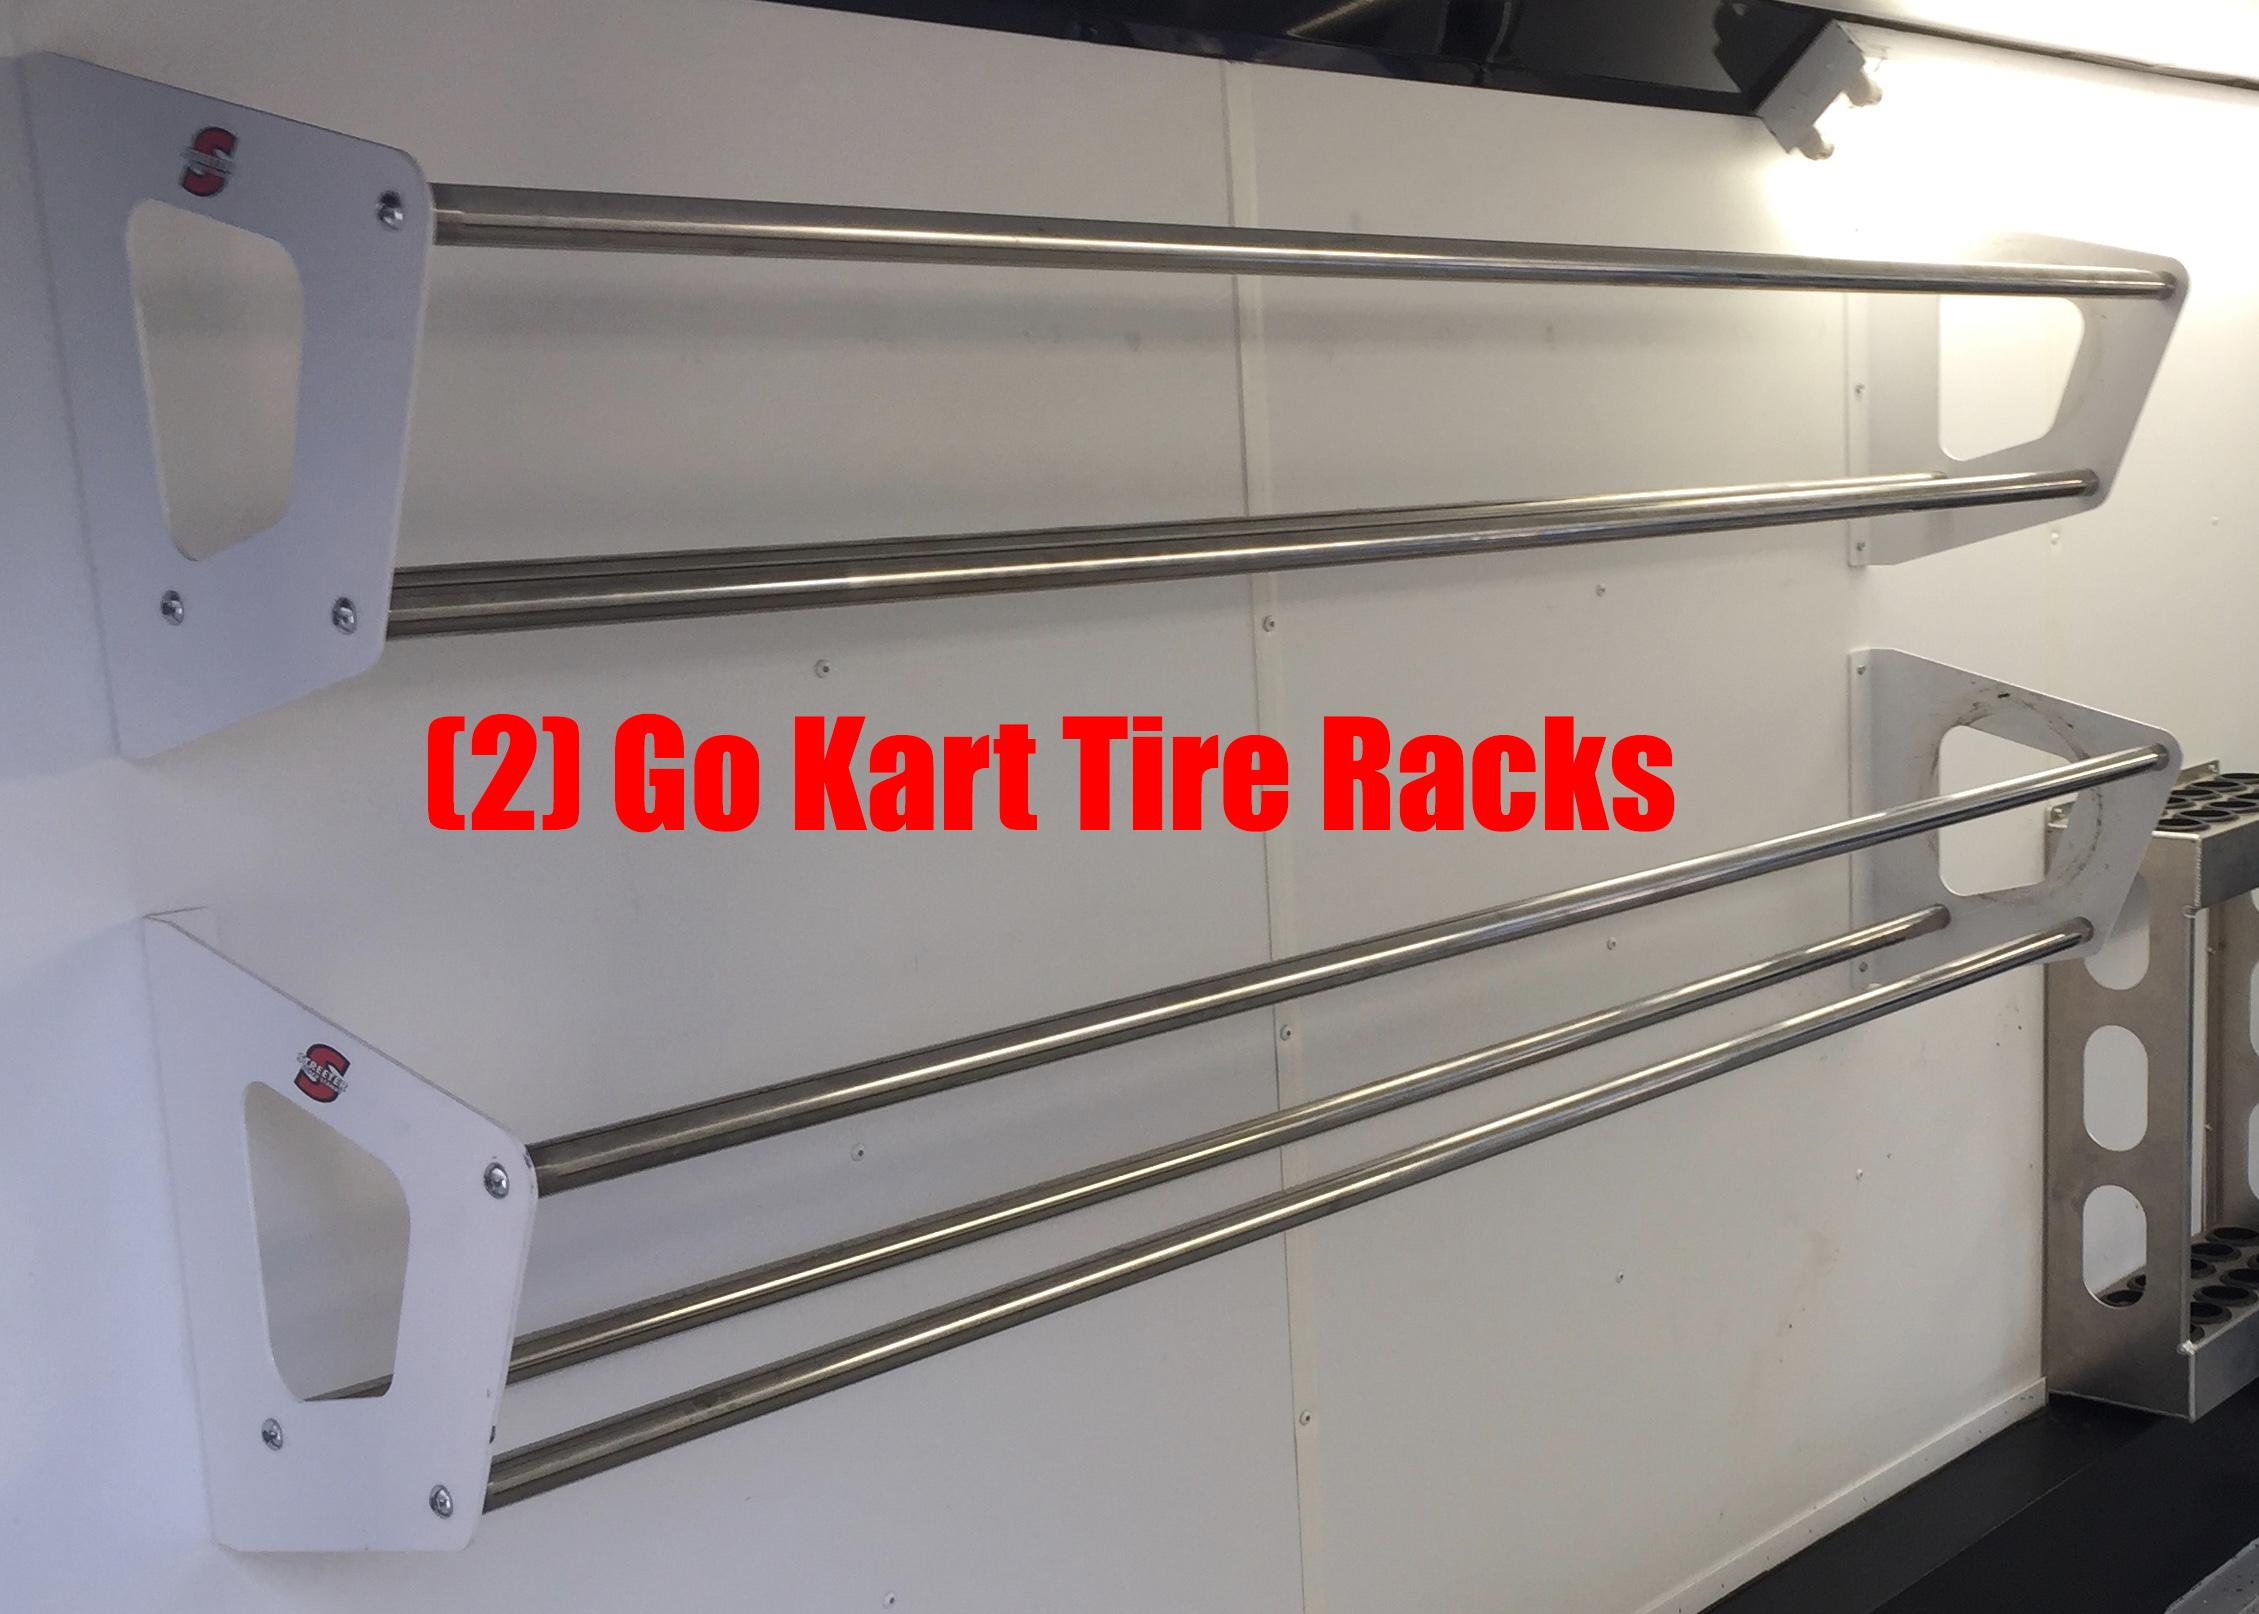 Go Kart Trailer Racks Tire Fuel Axle Lubricant Amp Work